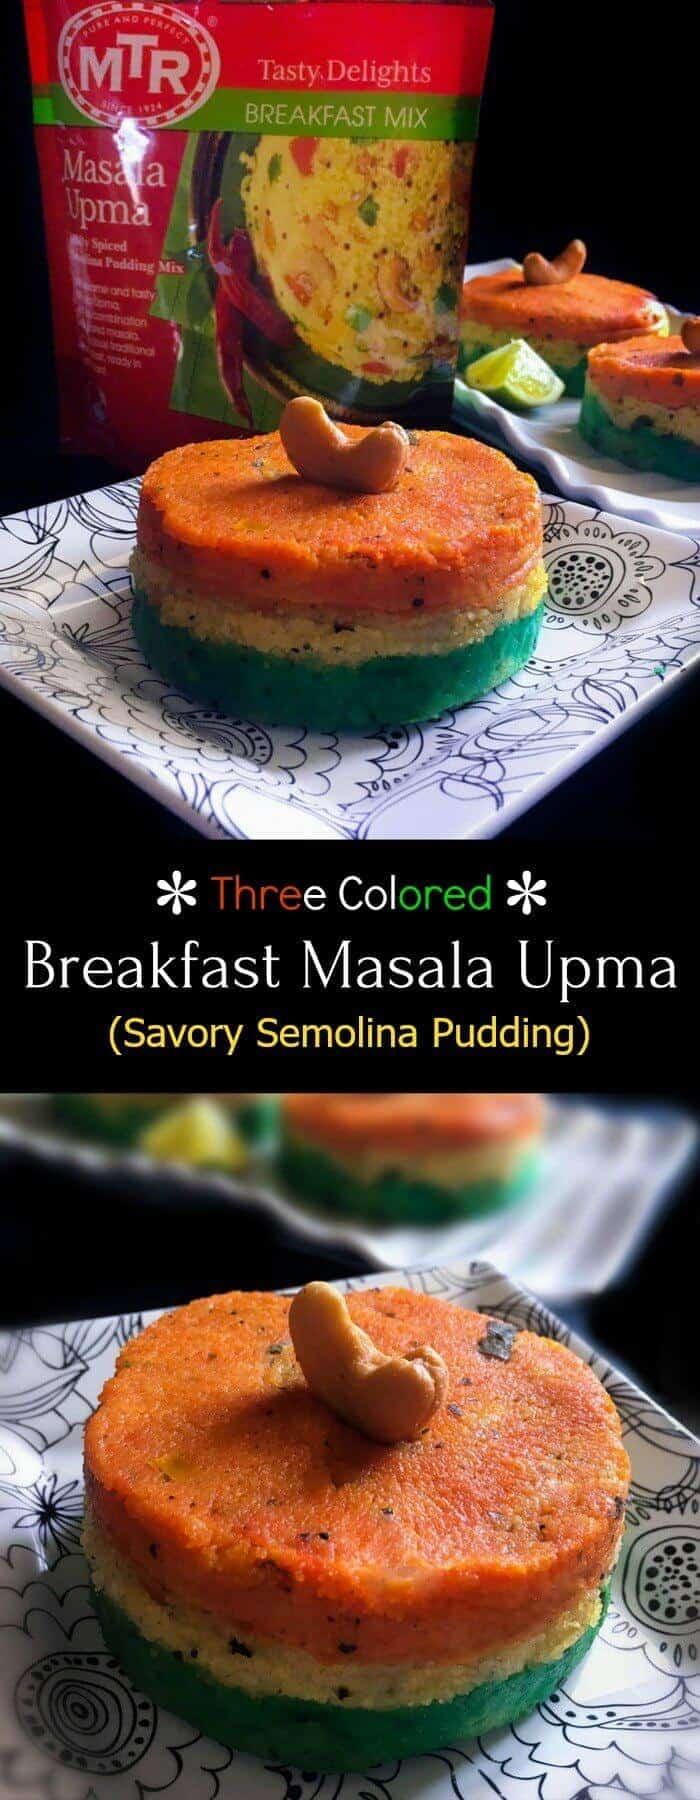 Three Color Breakfast Masala Upma : #ad #upma #breakfast #indian #recipe #mtr